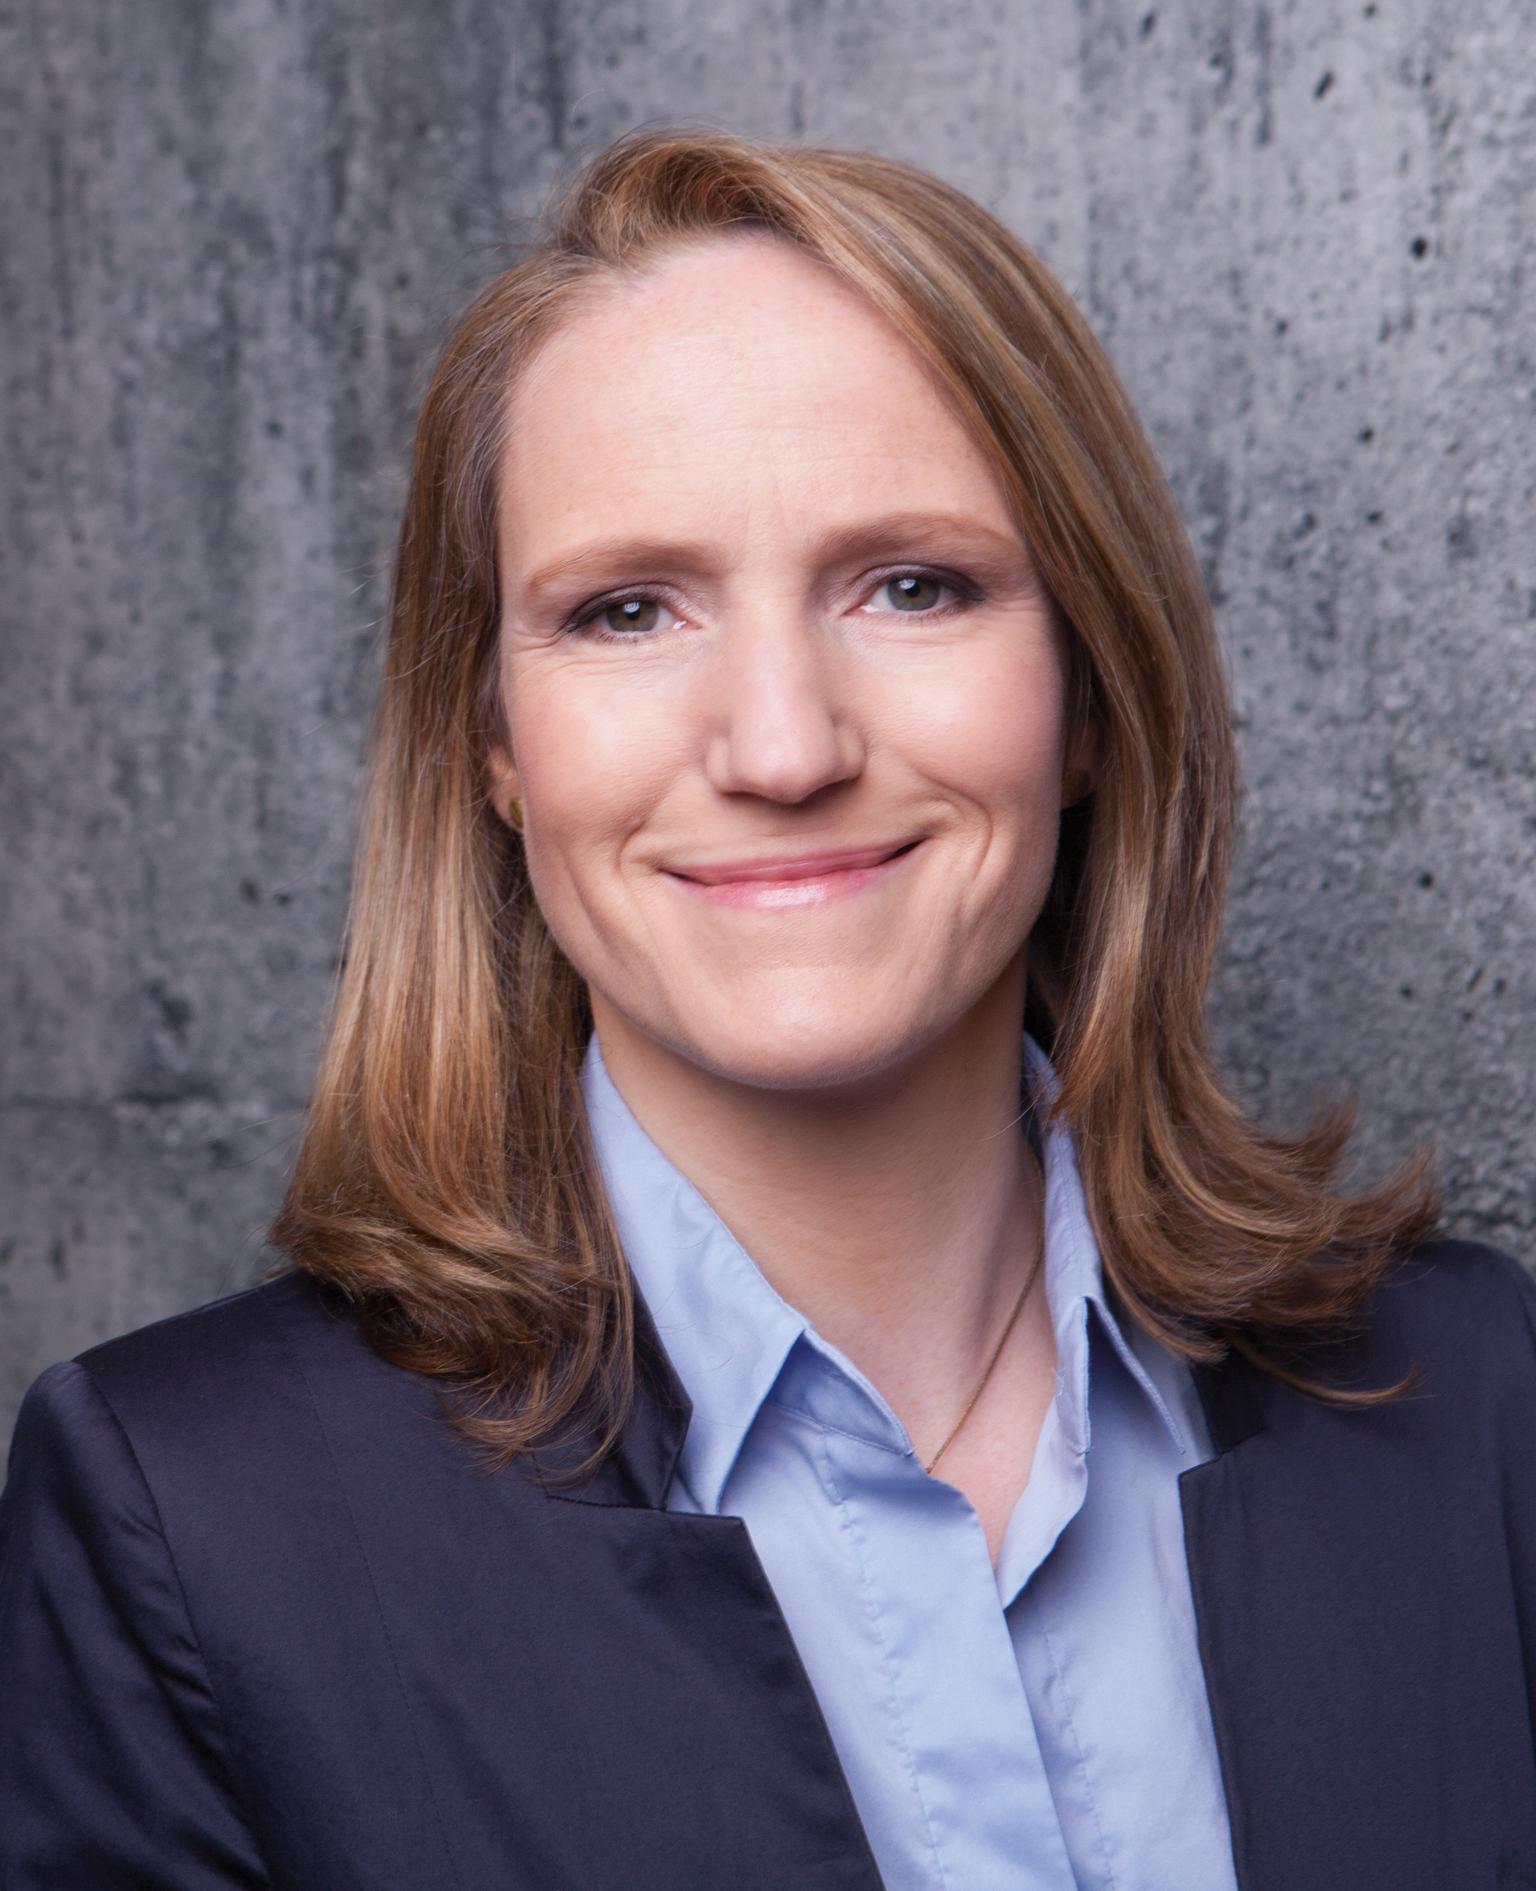 Sifa-Stammtisch:-Gründerin Katja Haufe-Höfling